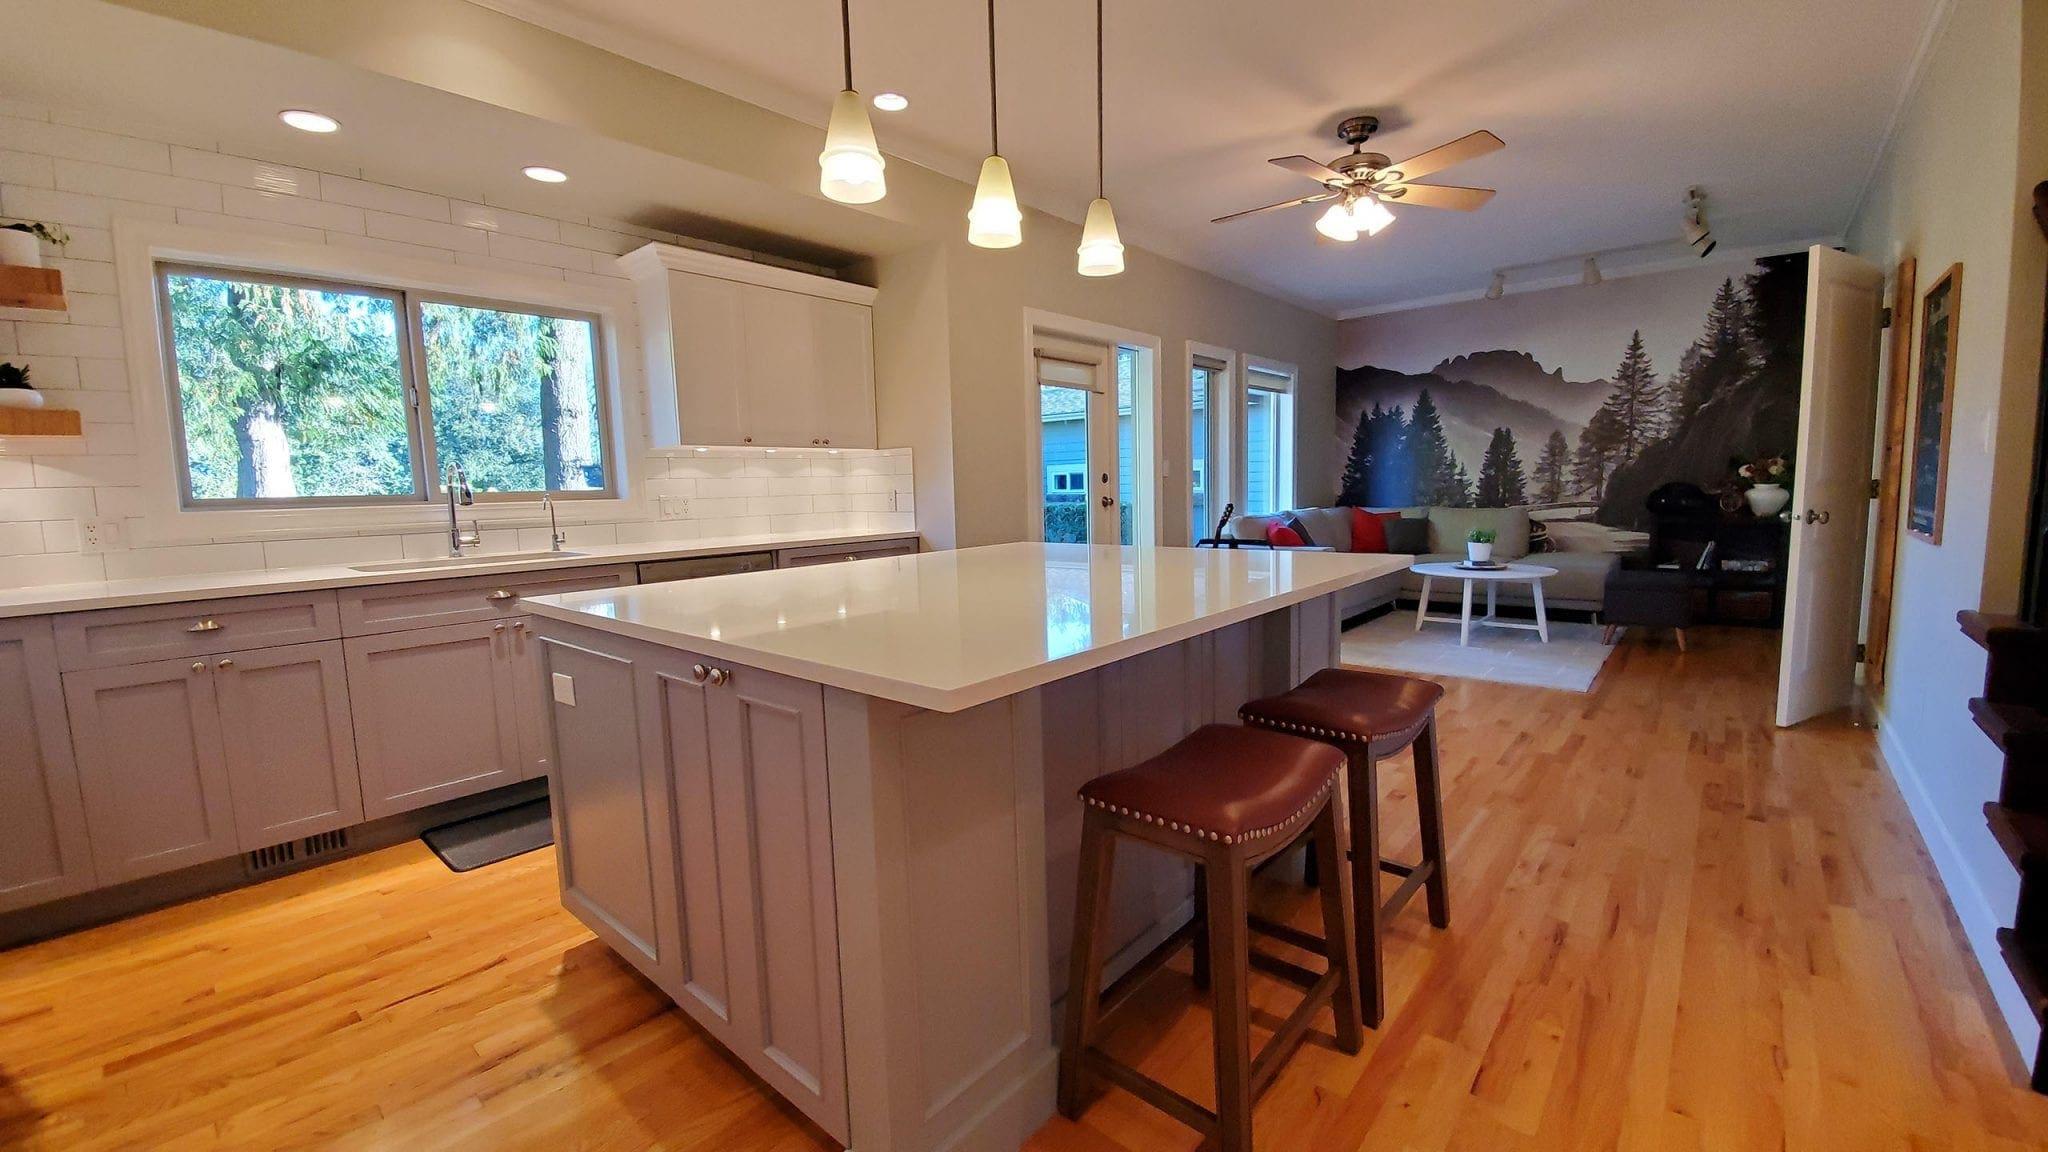 Master Painting & Renovations After Kitchen Renovation